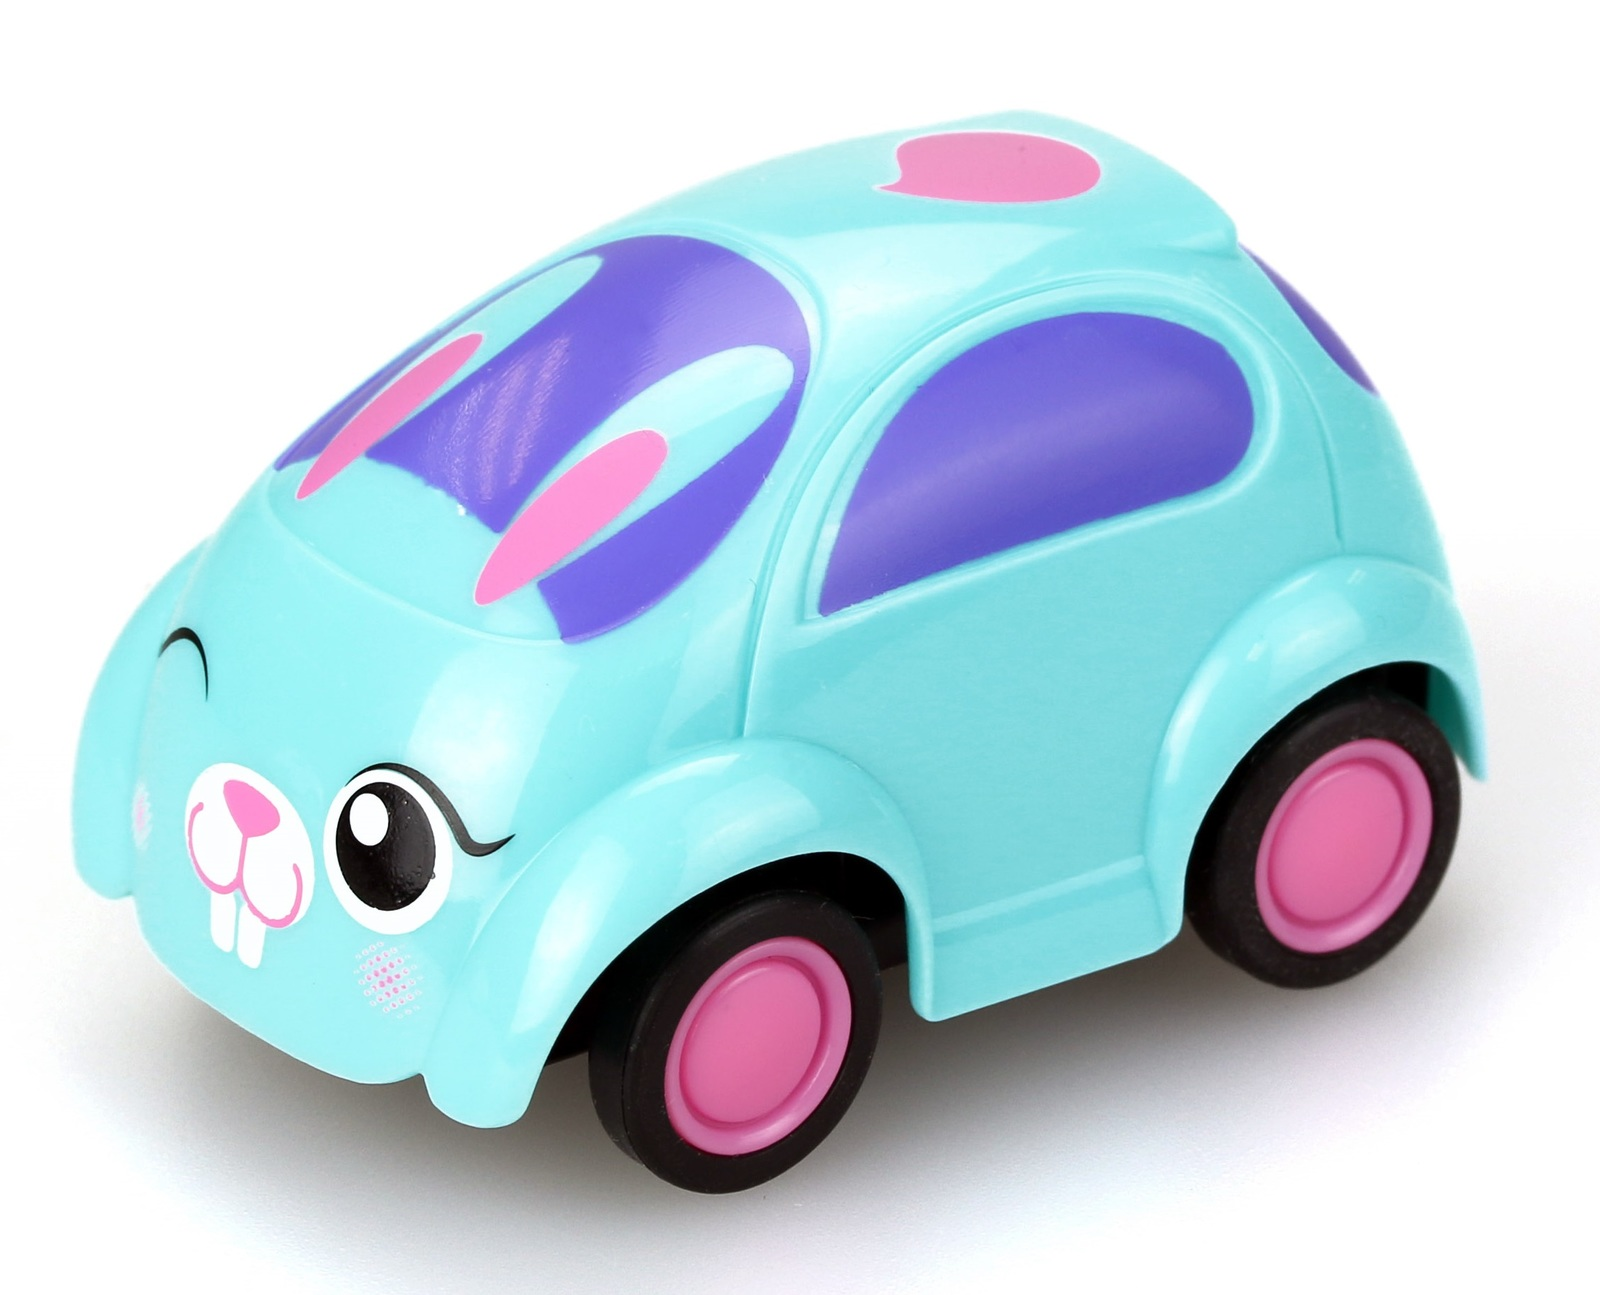 Silverlit: My Lil' Raceband - Blue Bunny image